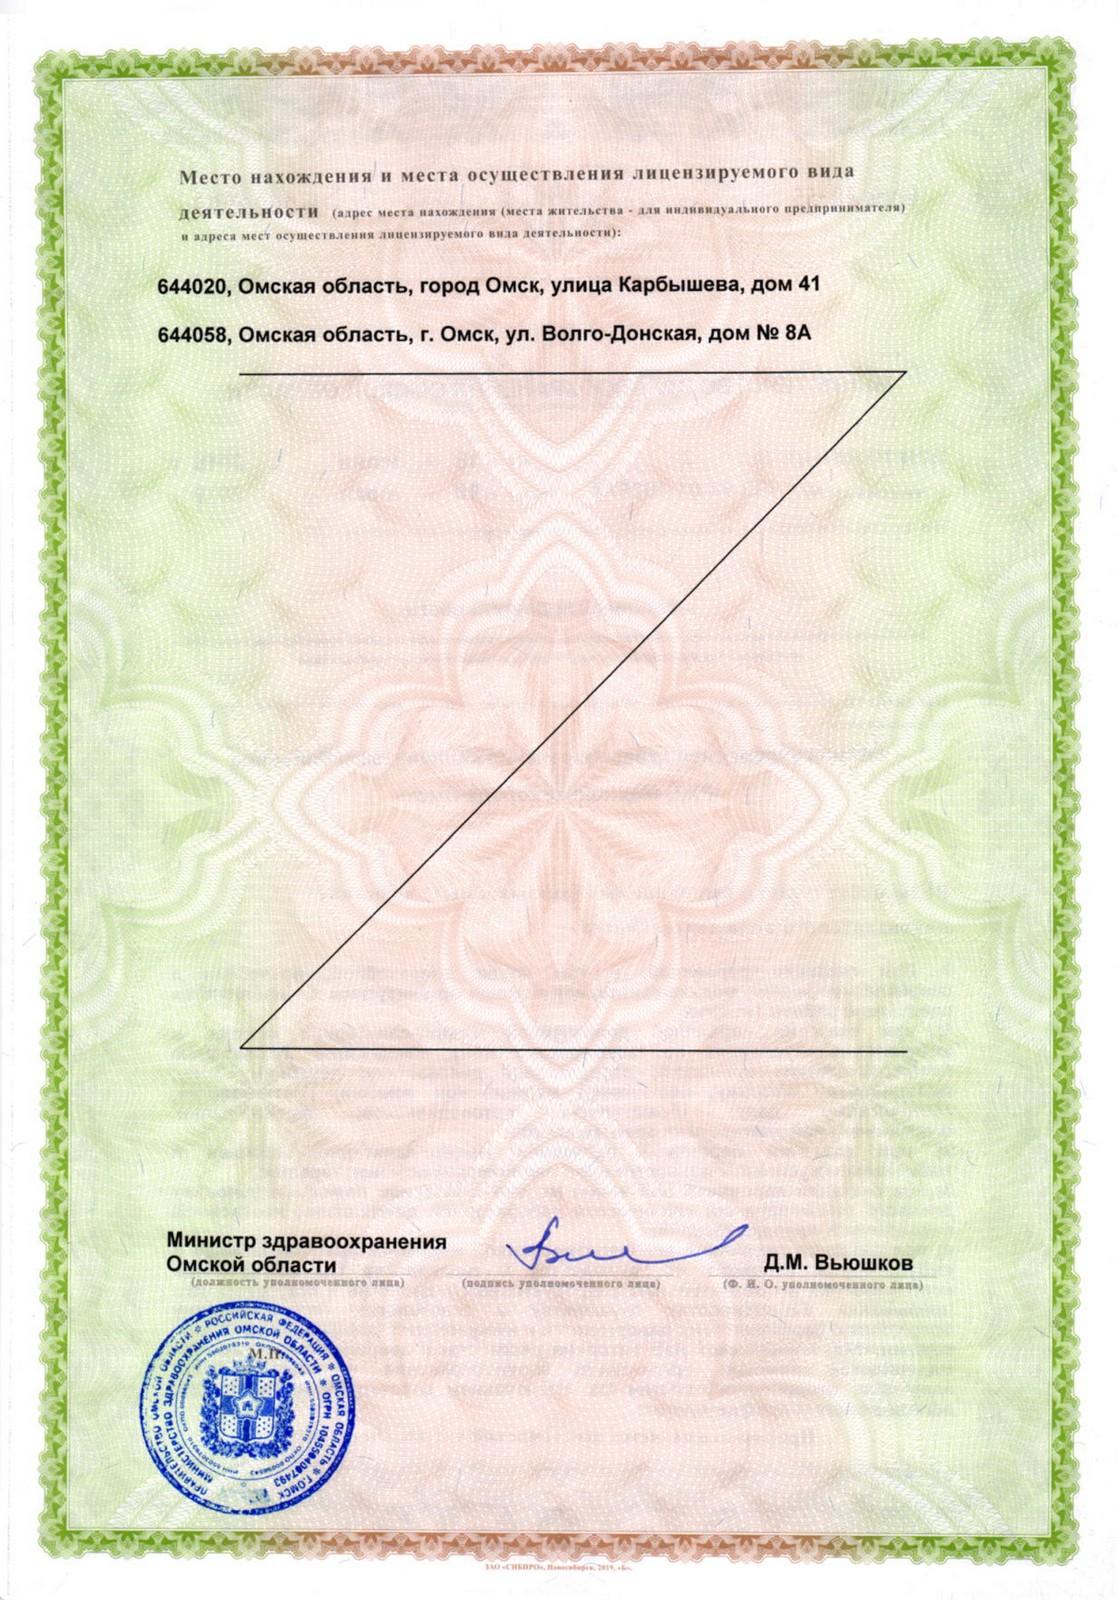 License-2019-07-18_22